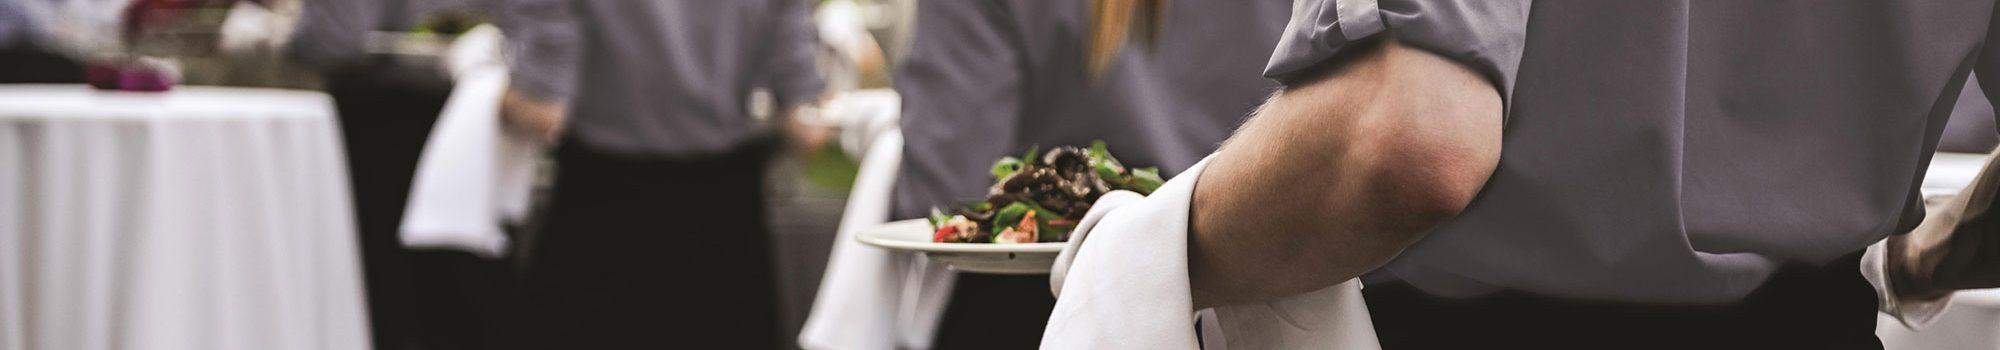 banner_waiters